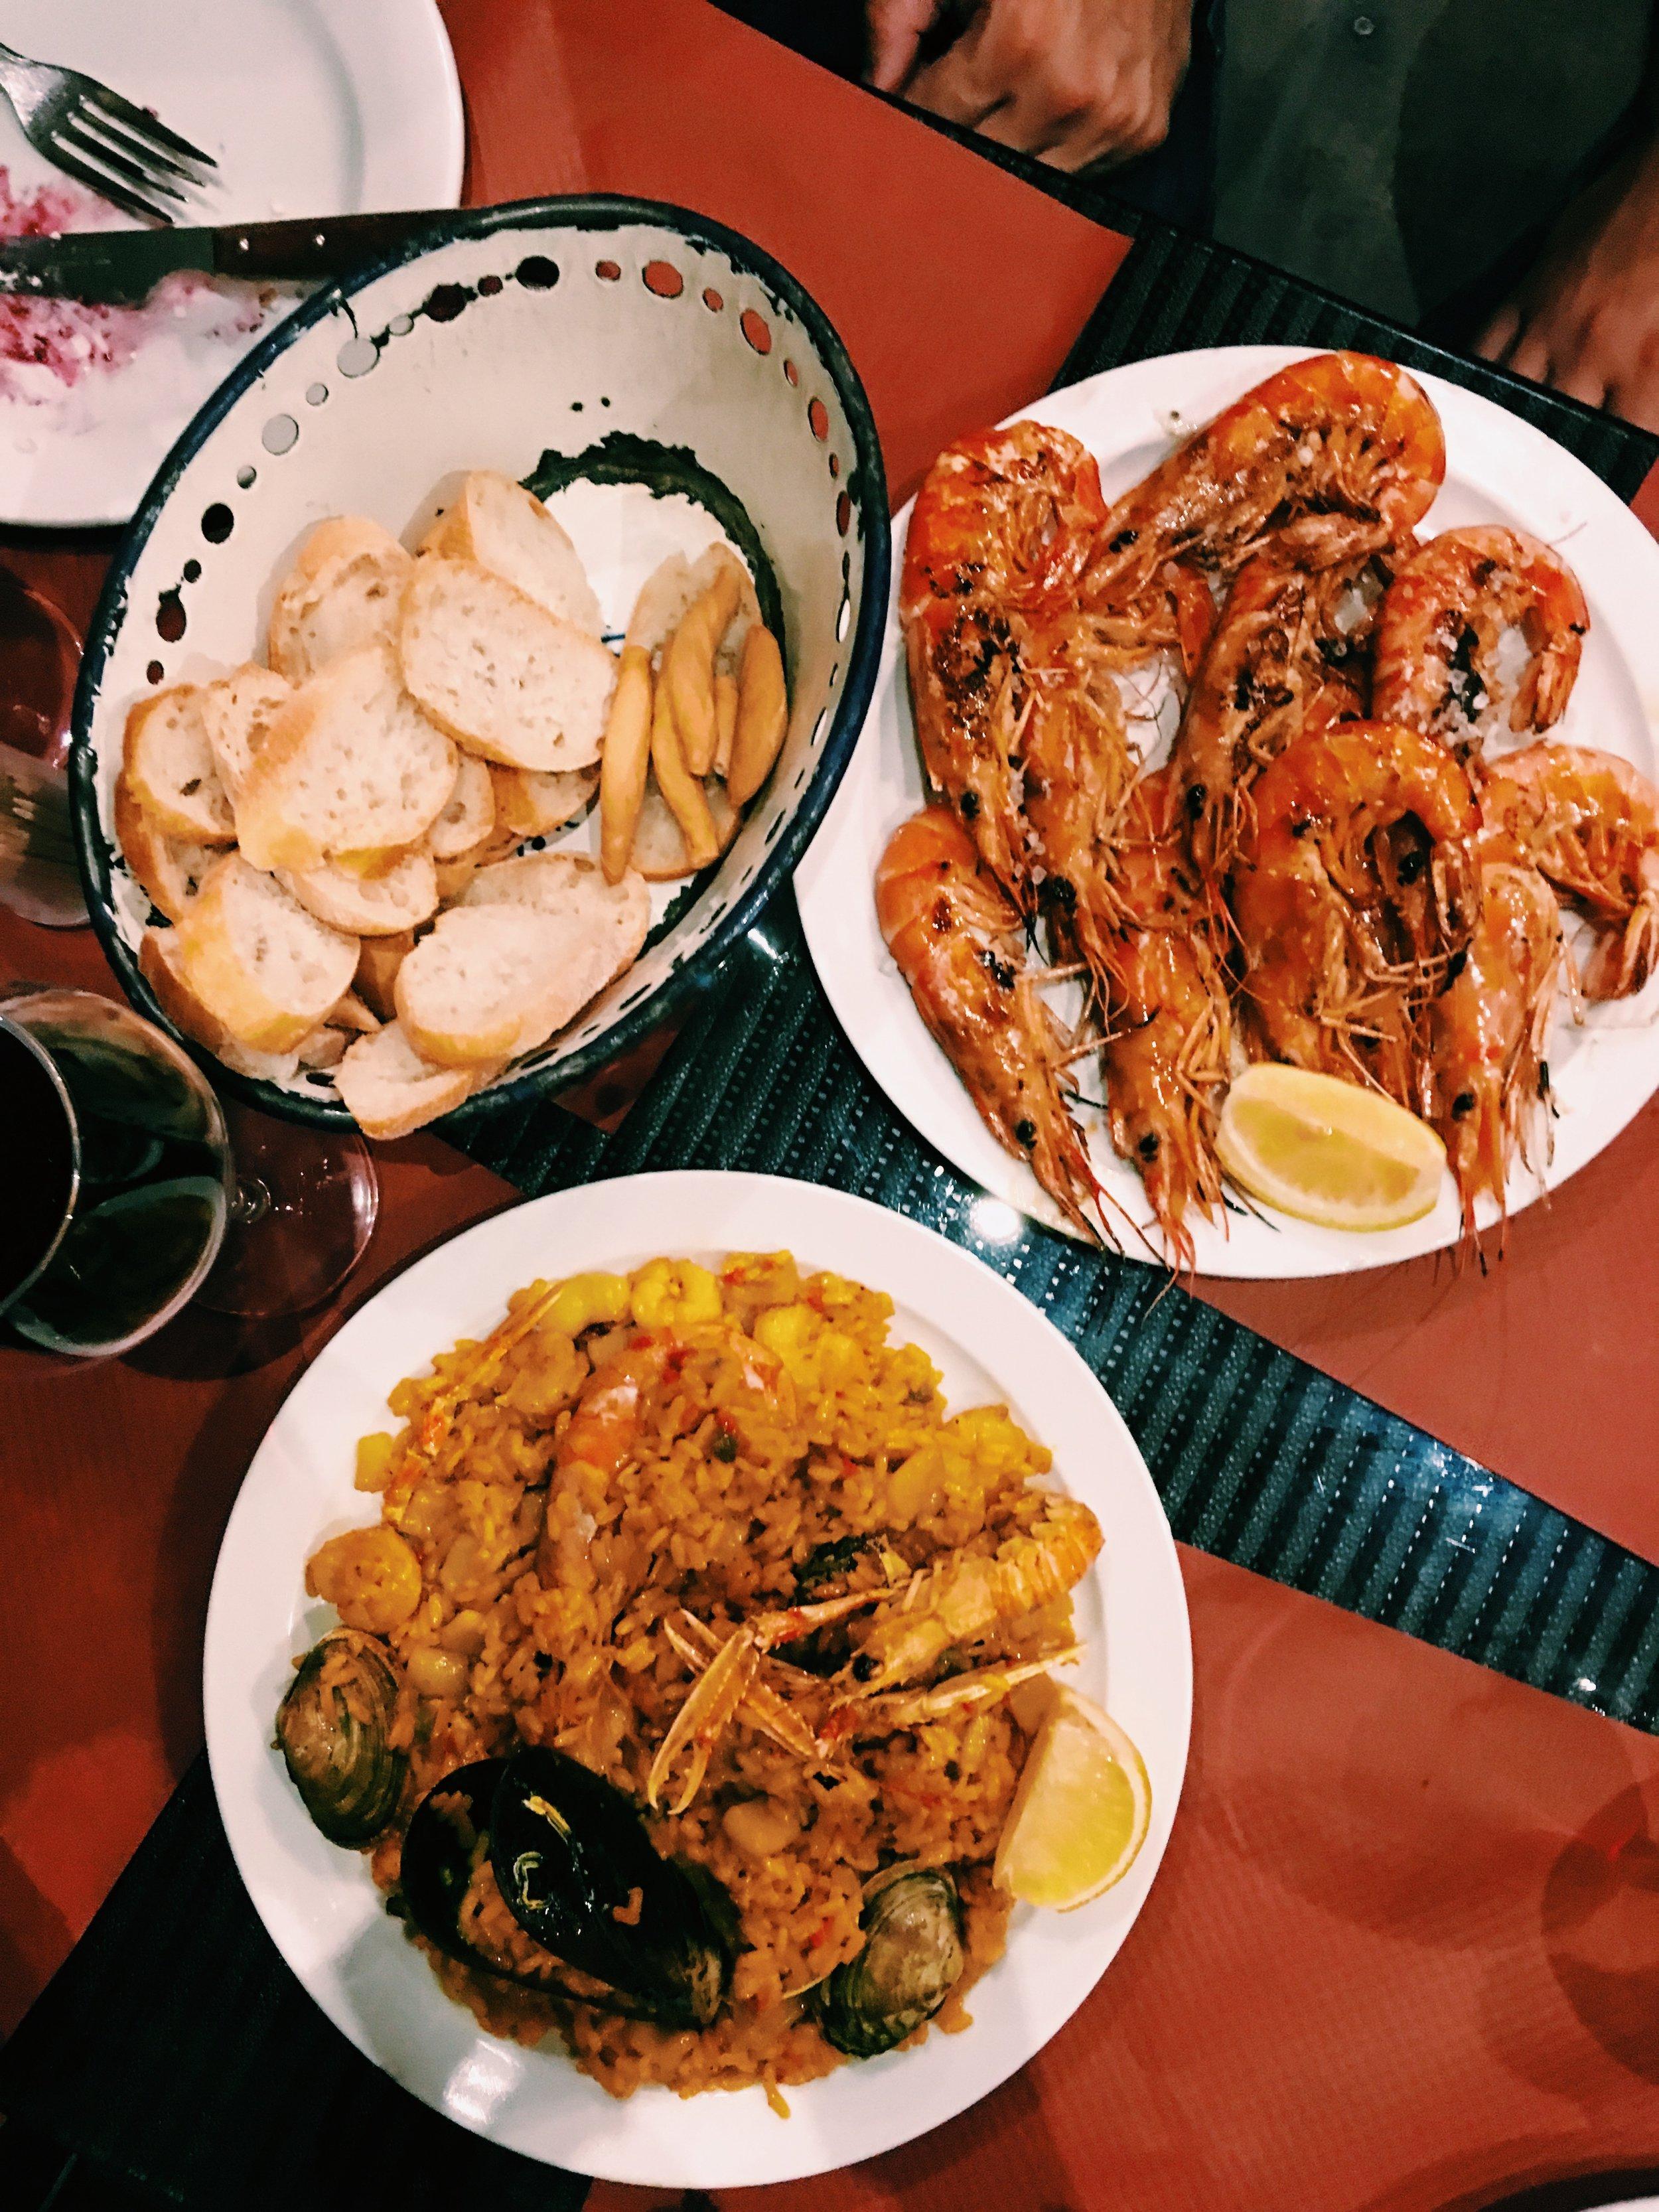 First taste of Spanish food at Alhambra